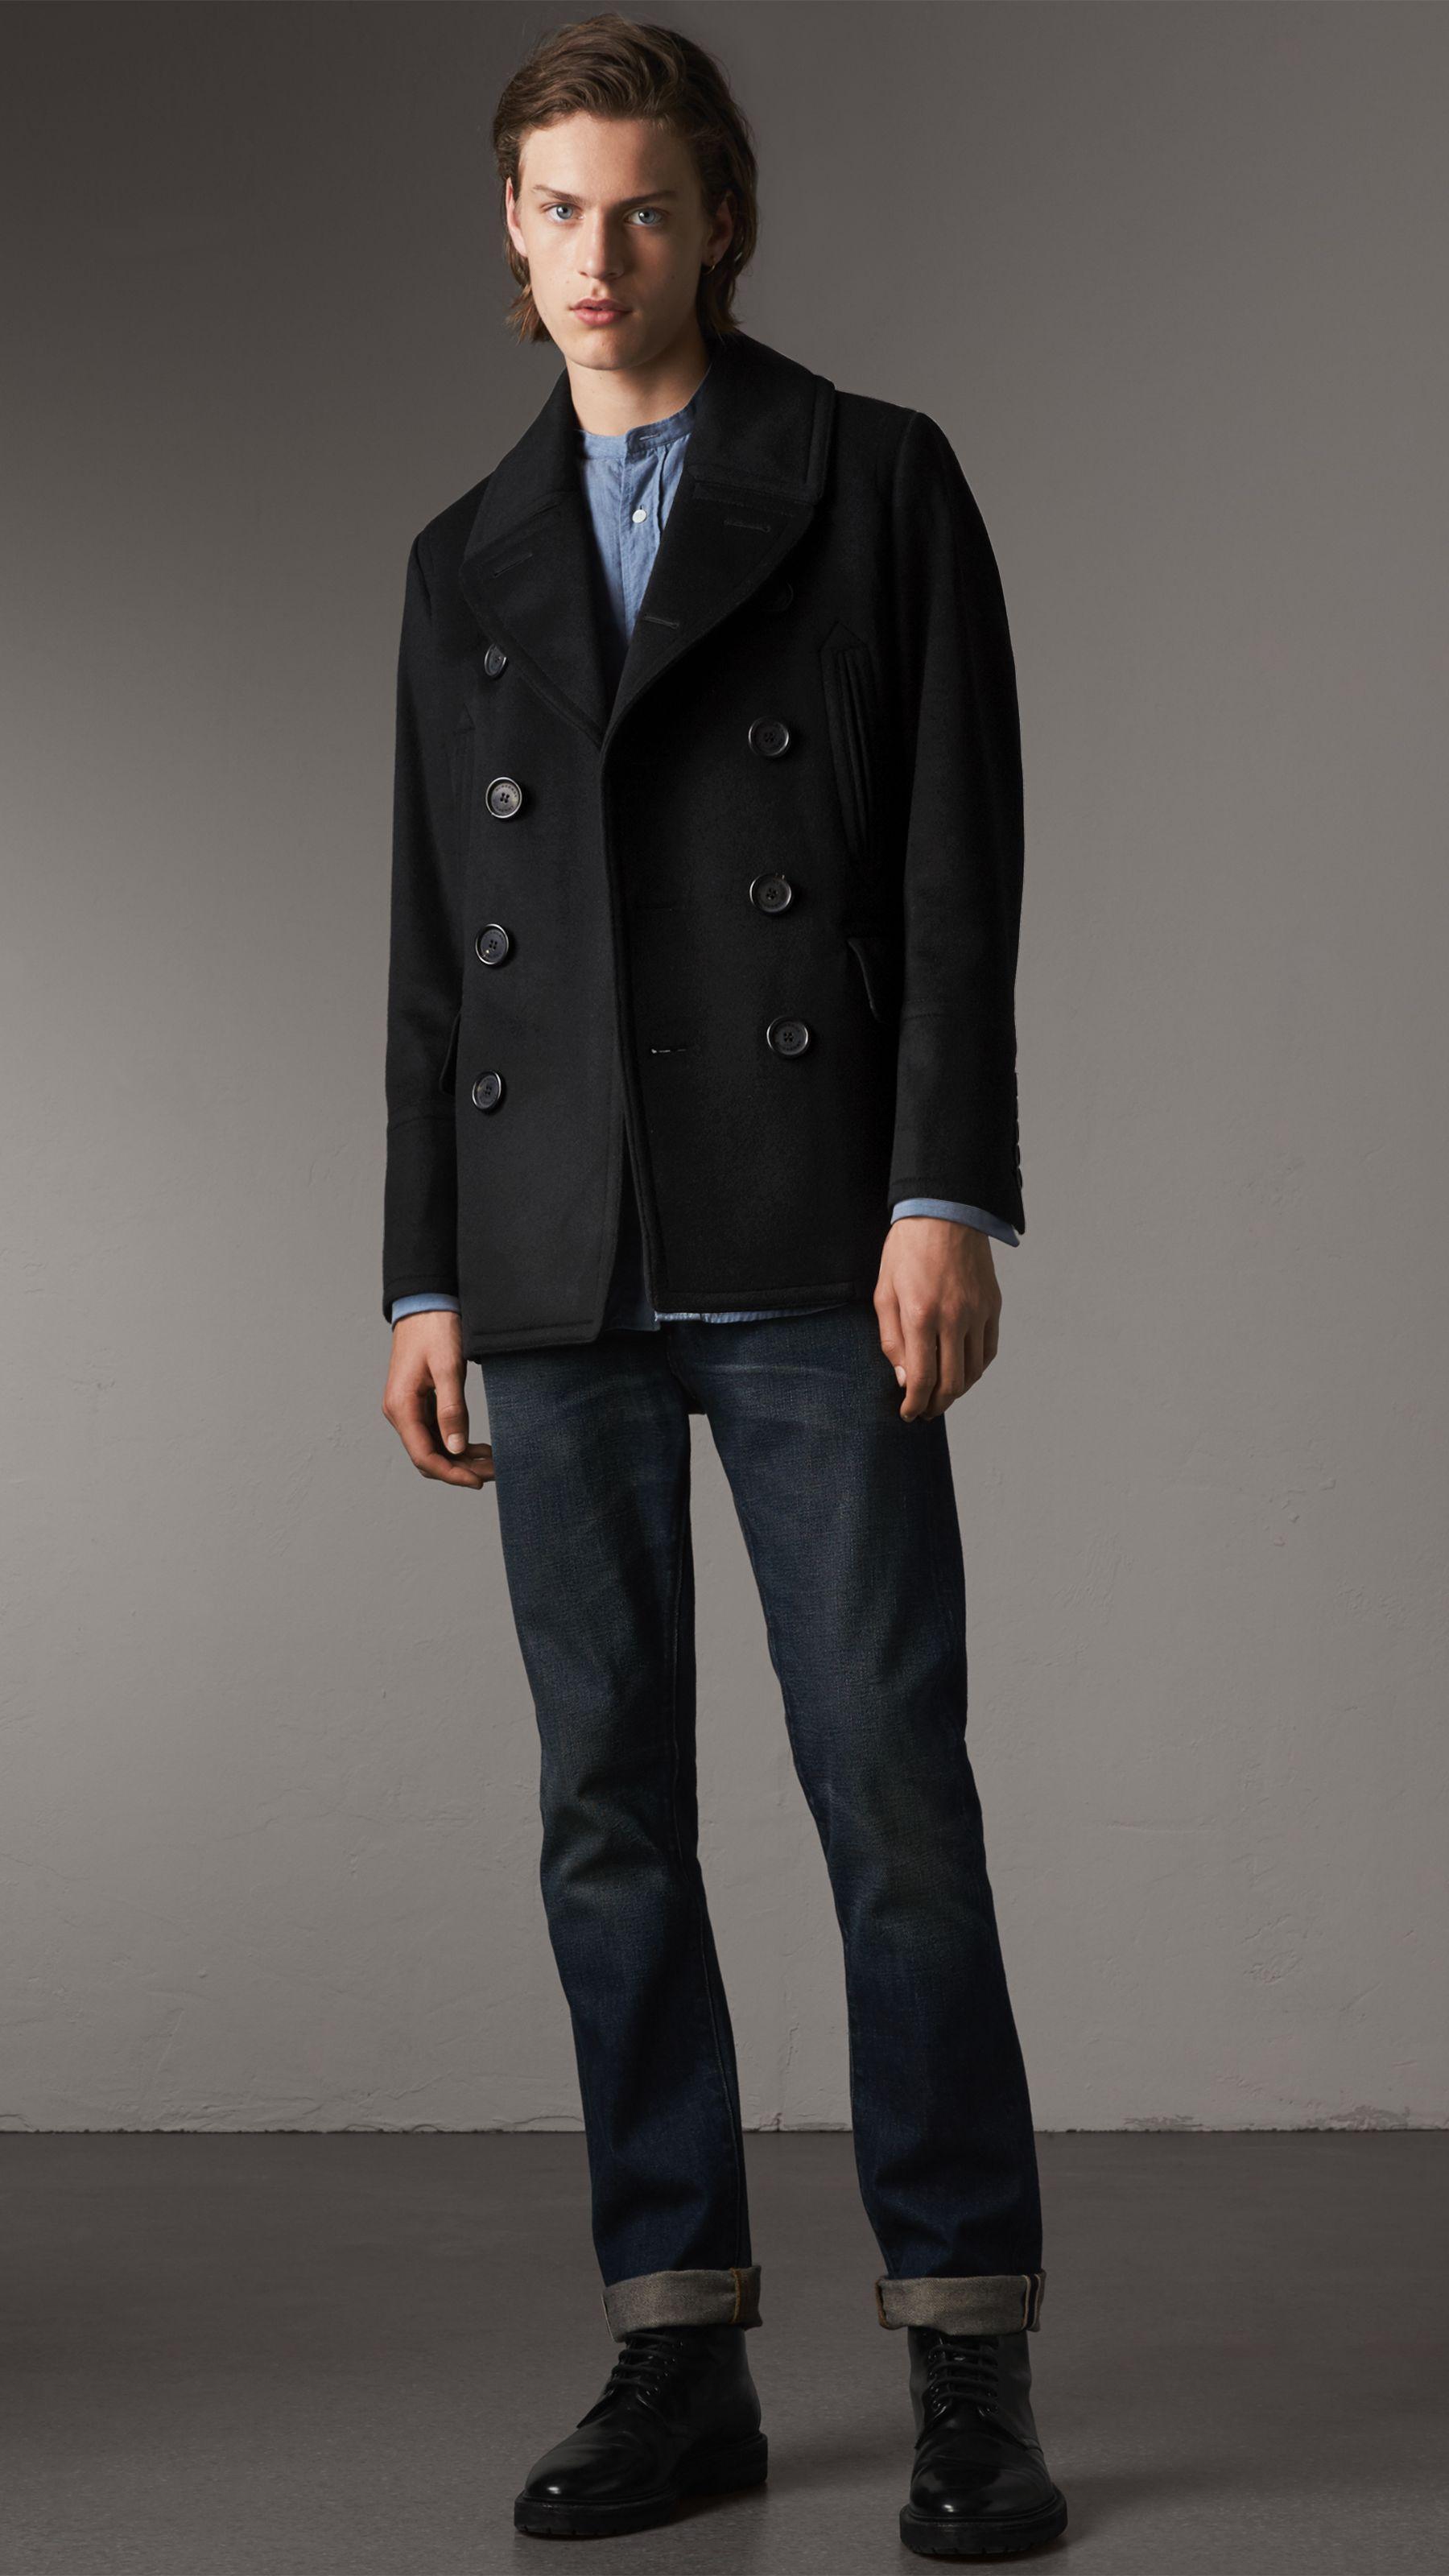 bd202376d51 Wool Cashmere Pea Coat in Black - Men